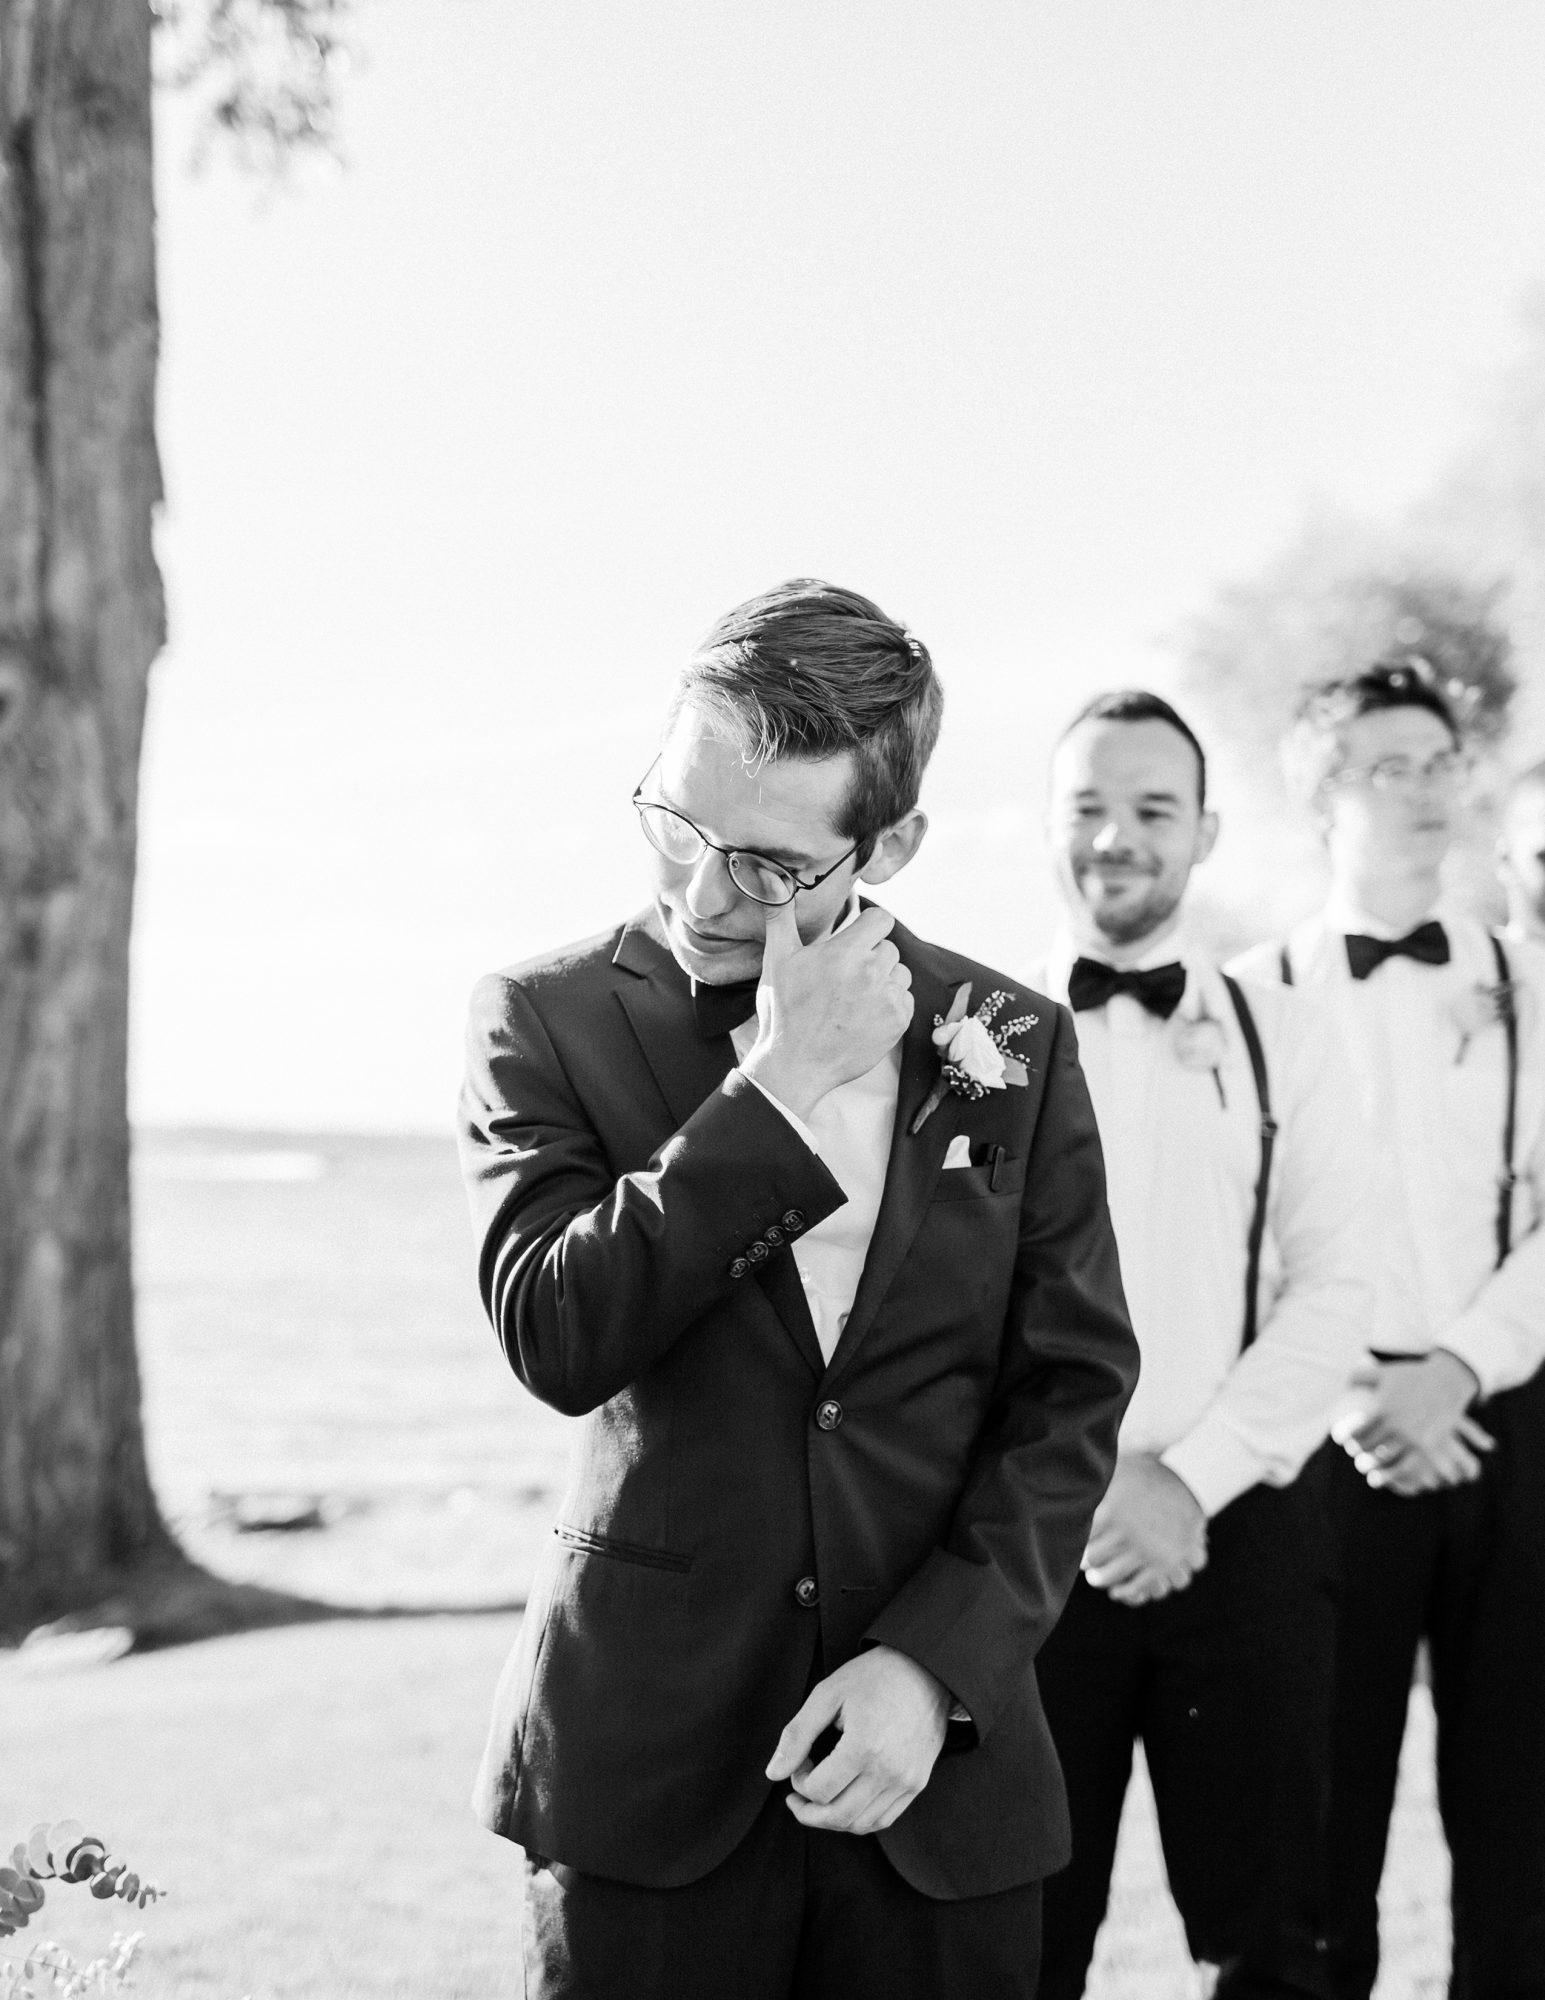 charlene jeremy wedding groom cries seeing bride